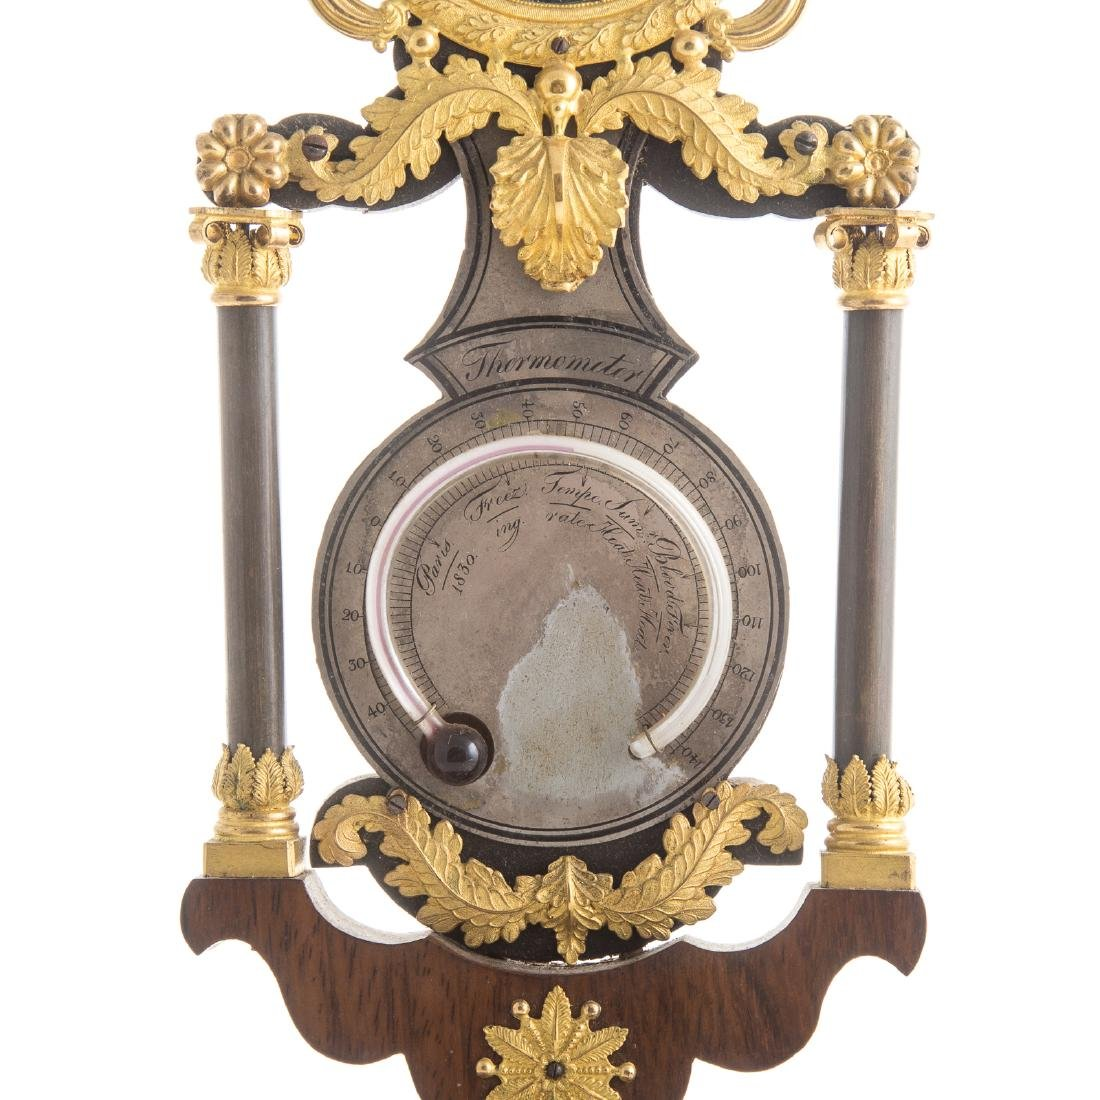 French Empire mantel clock - 4